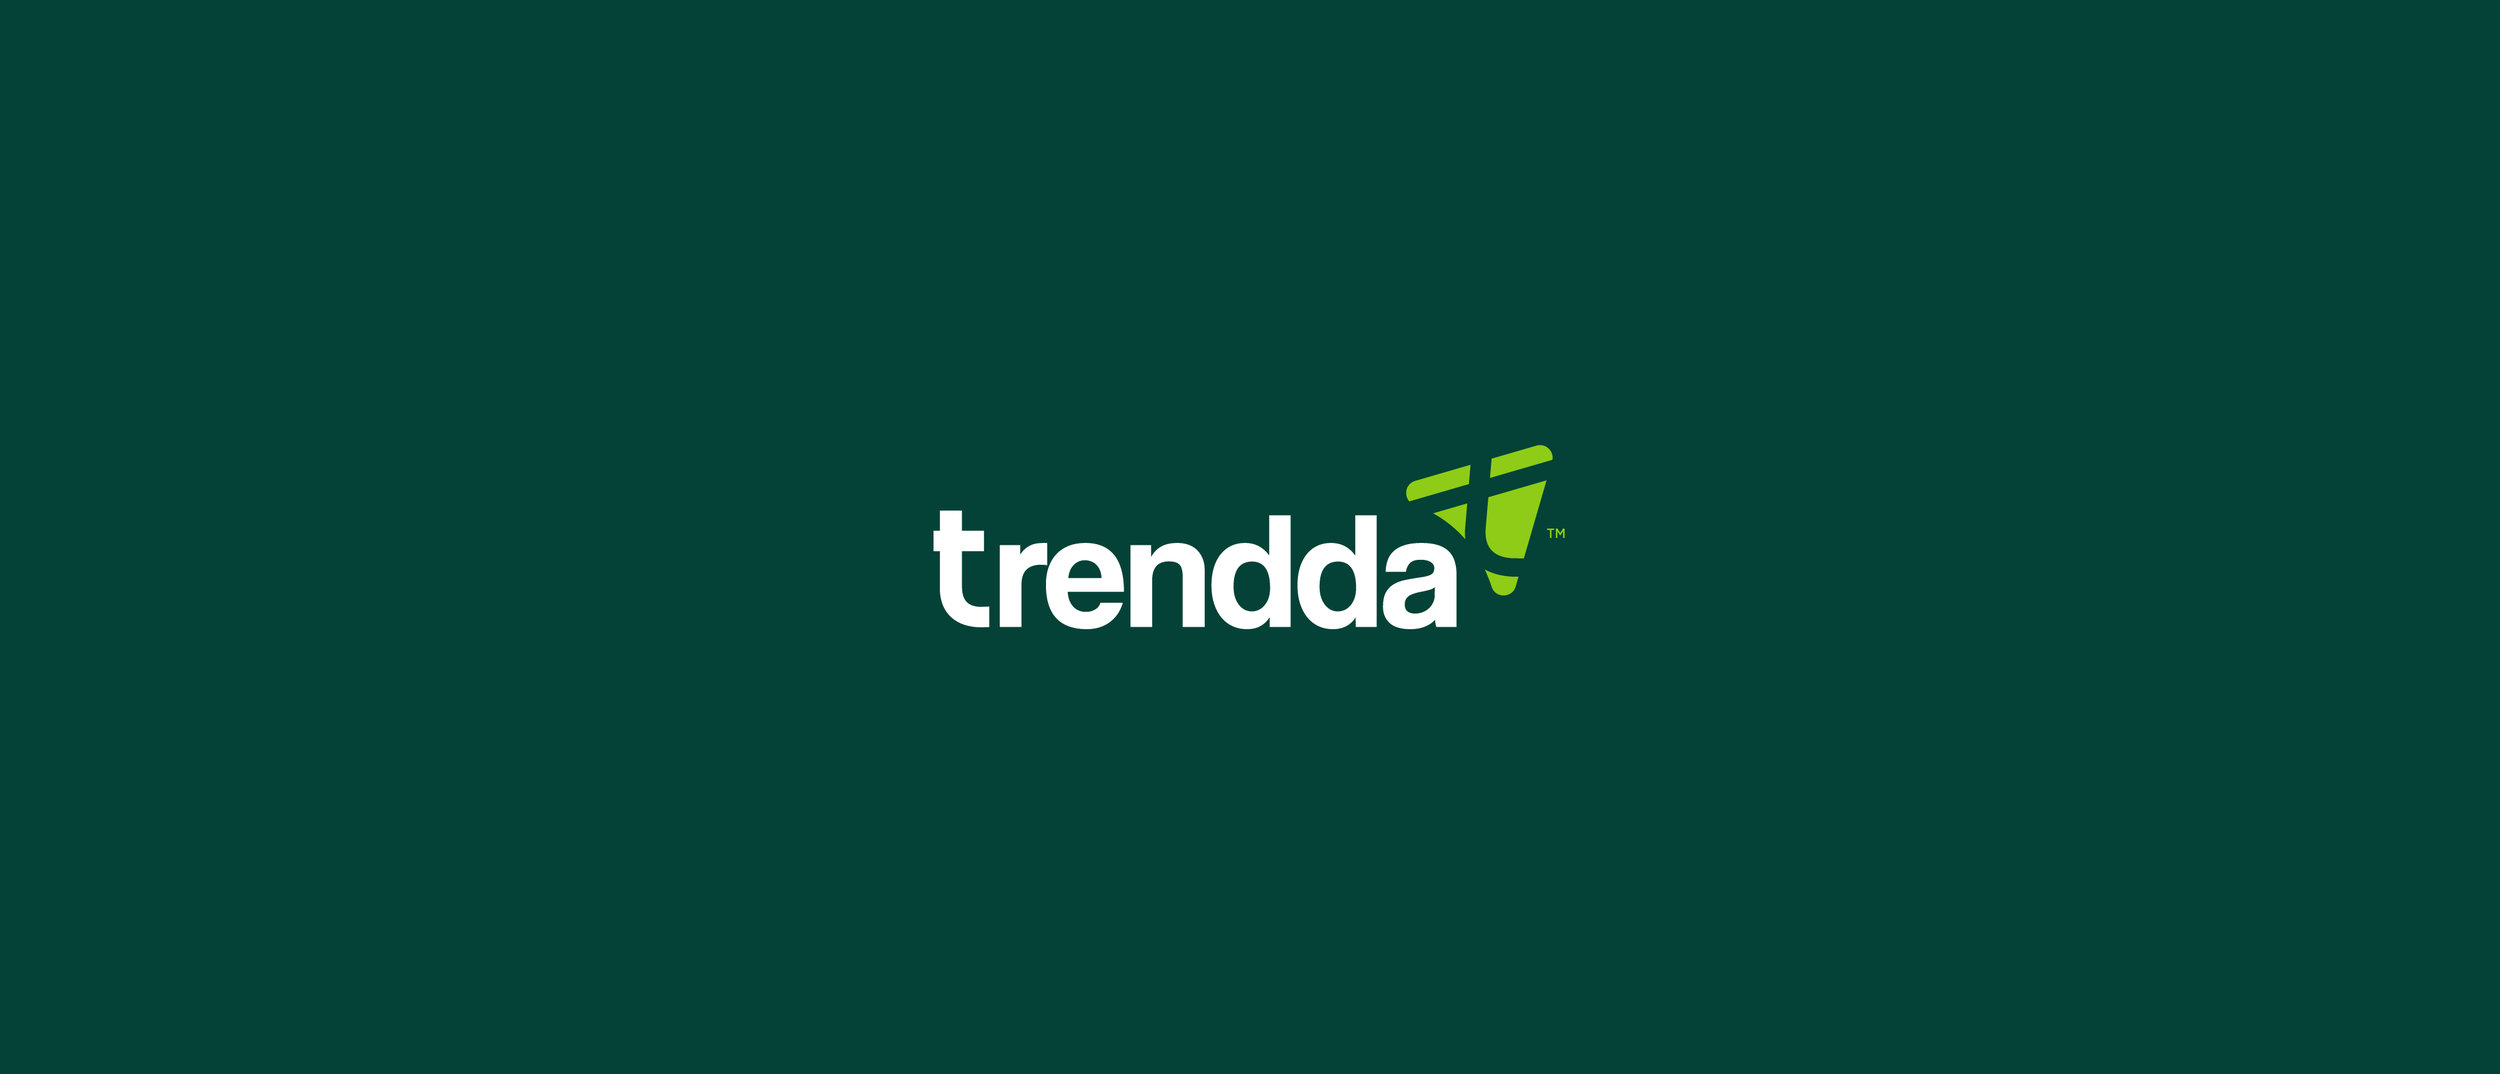 Trendda | Data Analytics Software | 2017